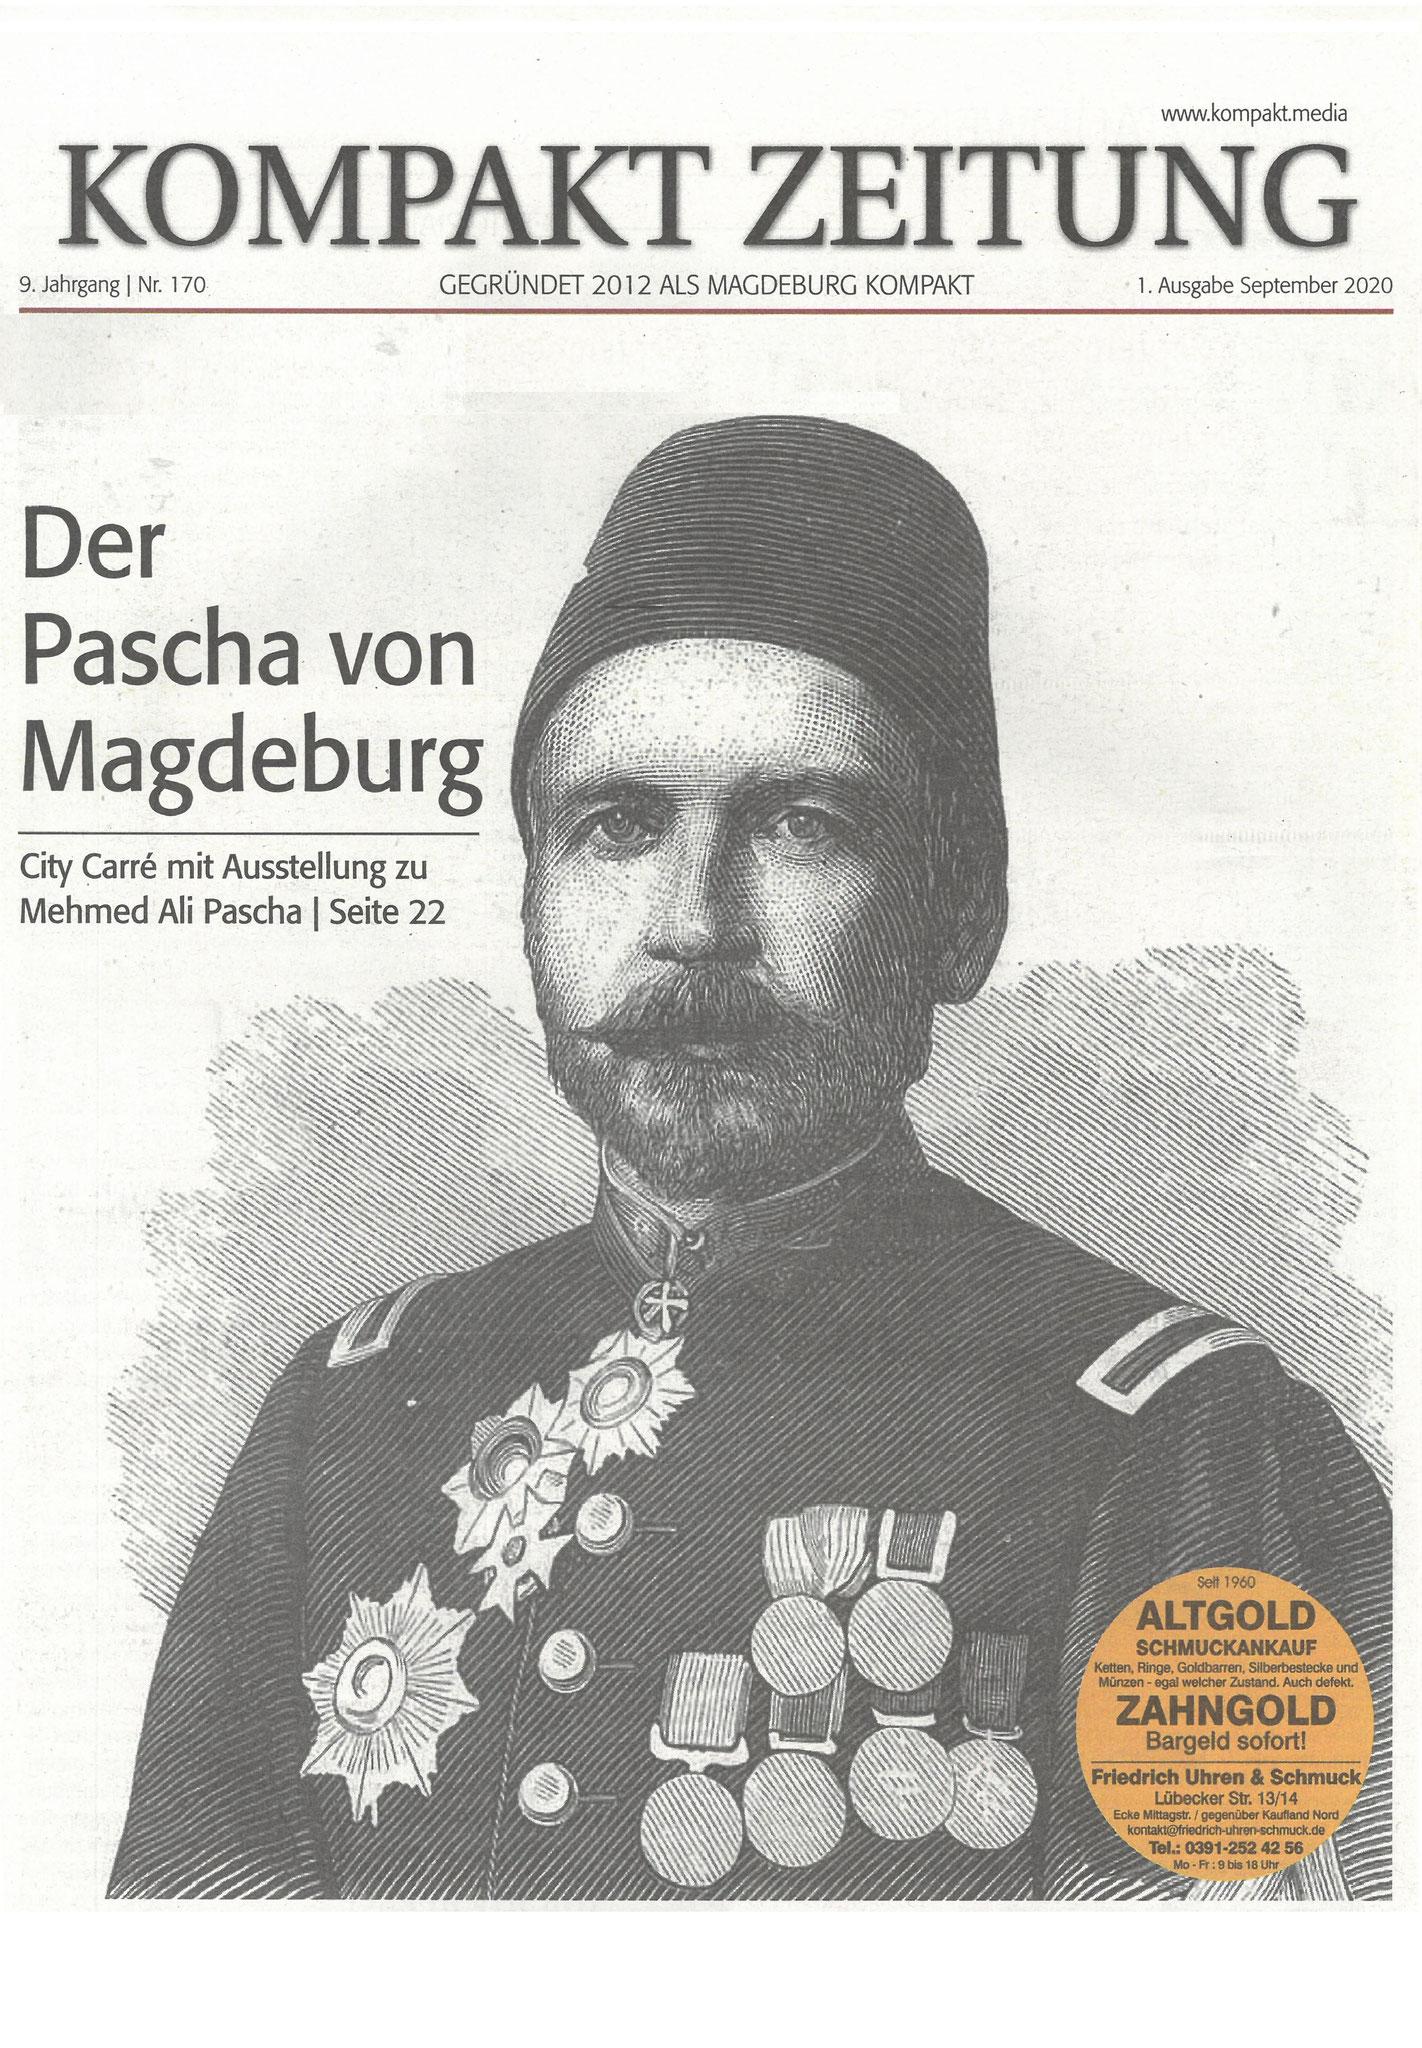 Magdeburg Kompakt (1. Ausgabe September 2020)